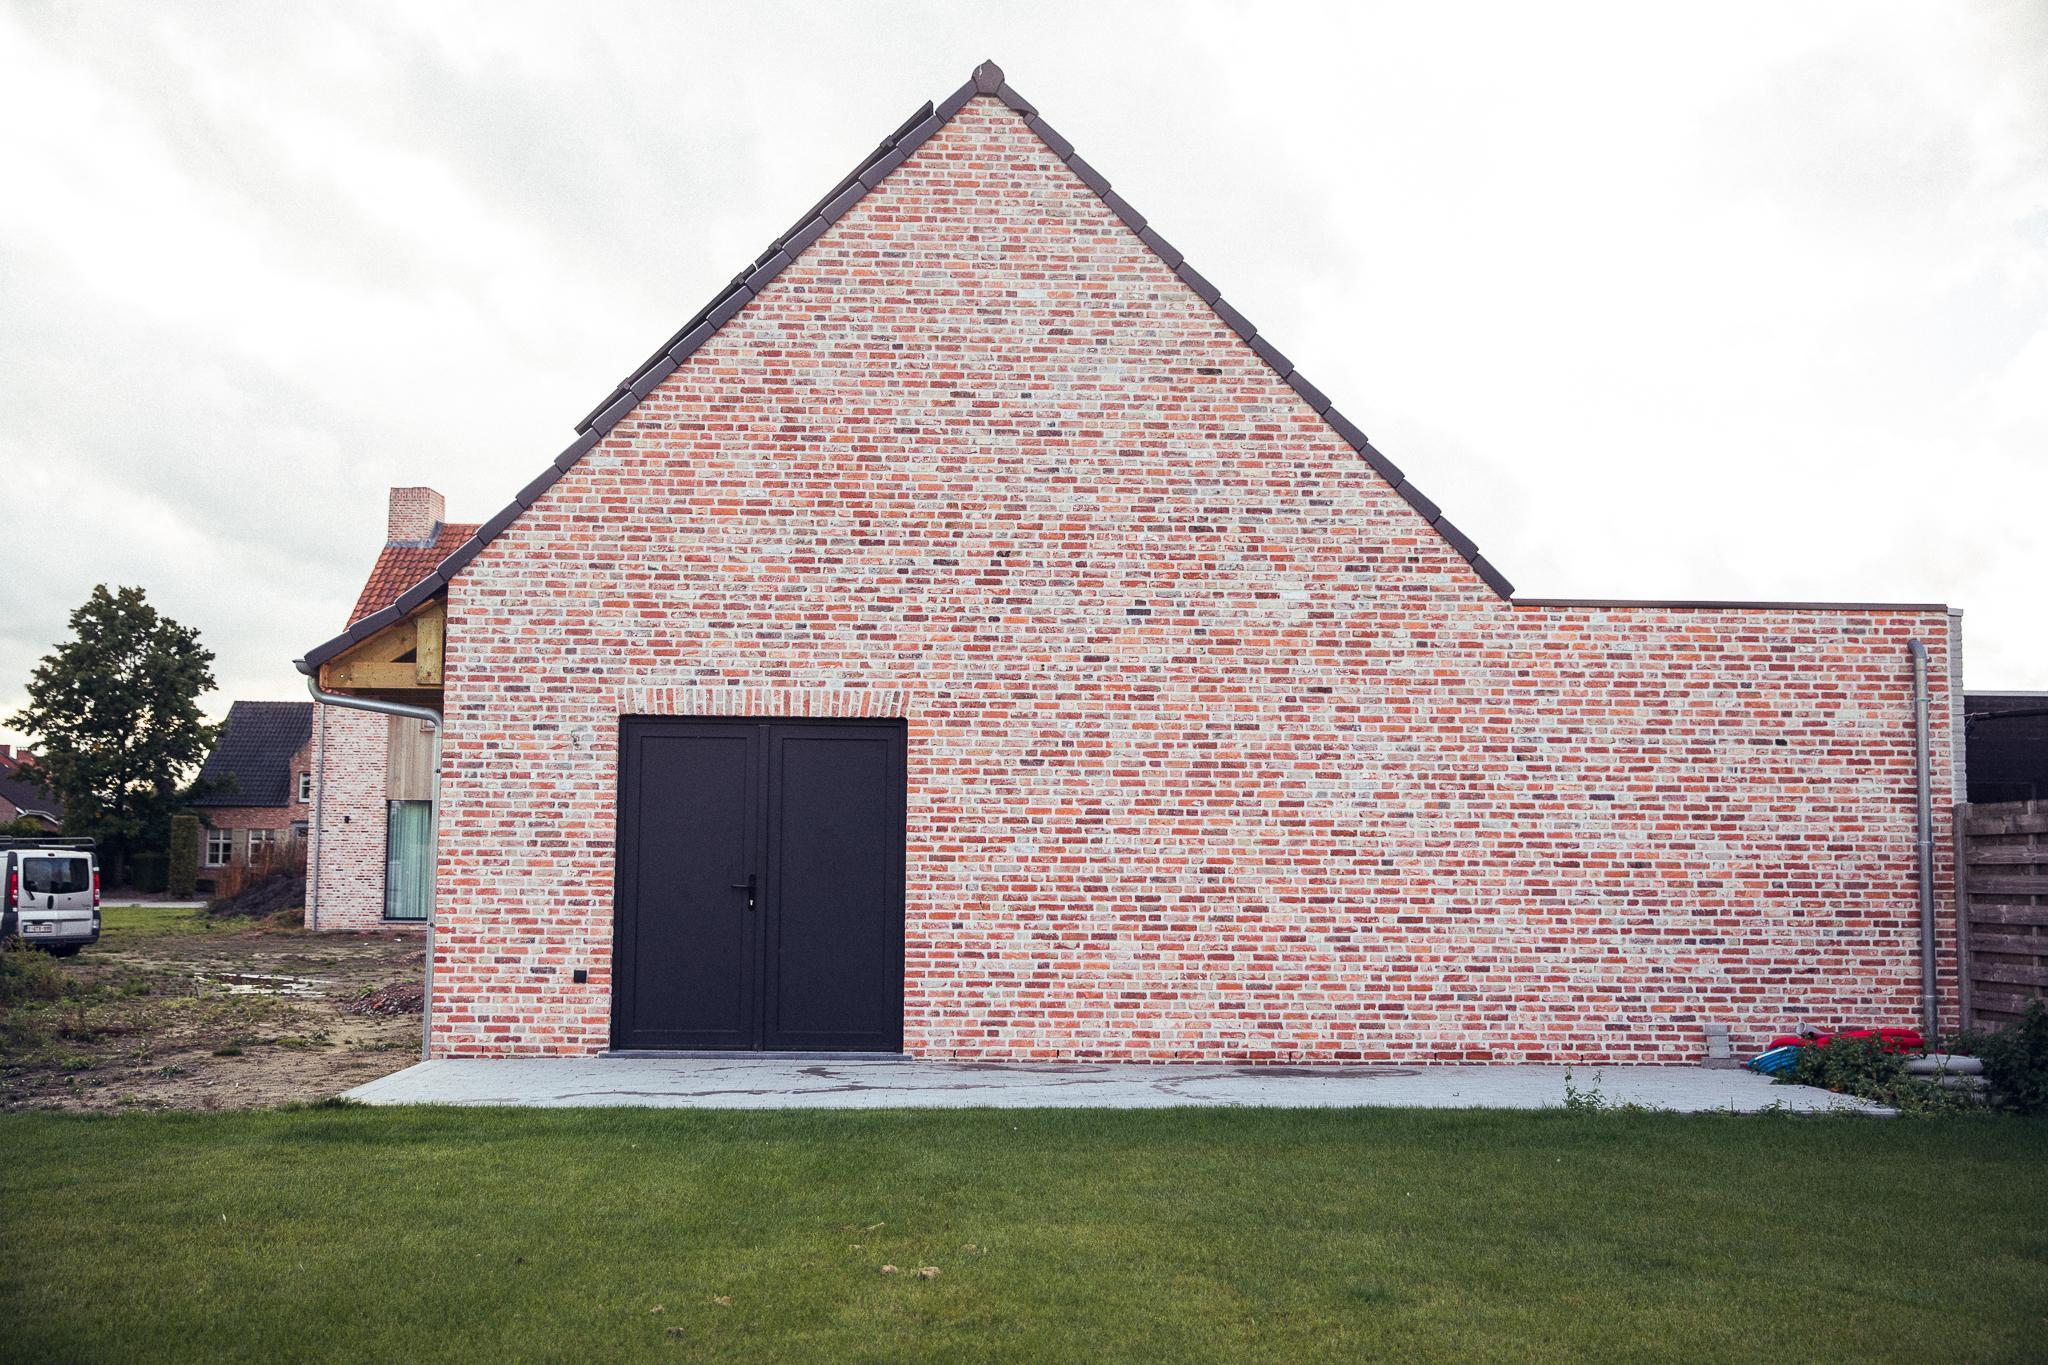 Nieuwbouw | Bouwonderneming Thijs Anthonissen